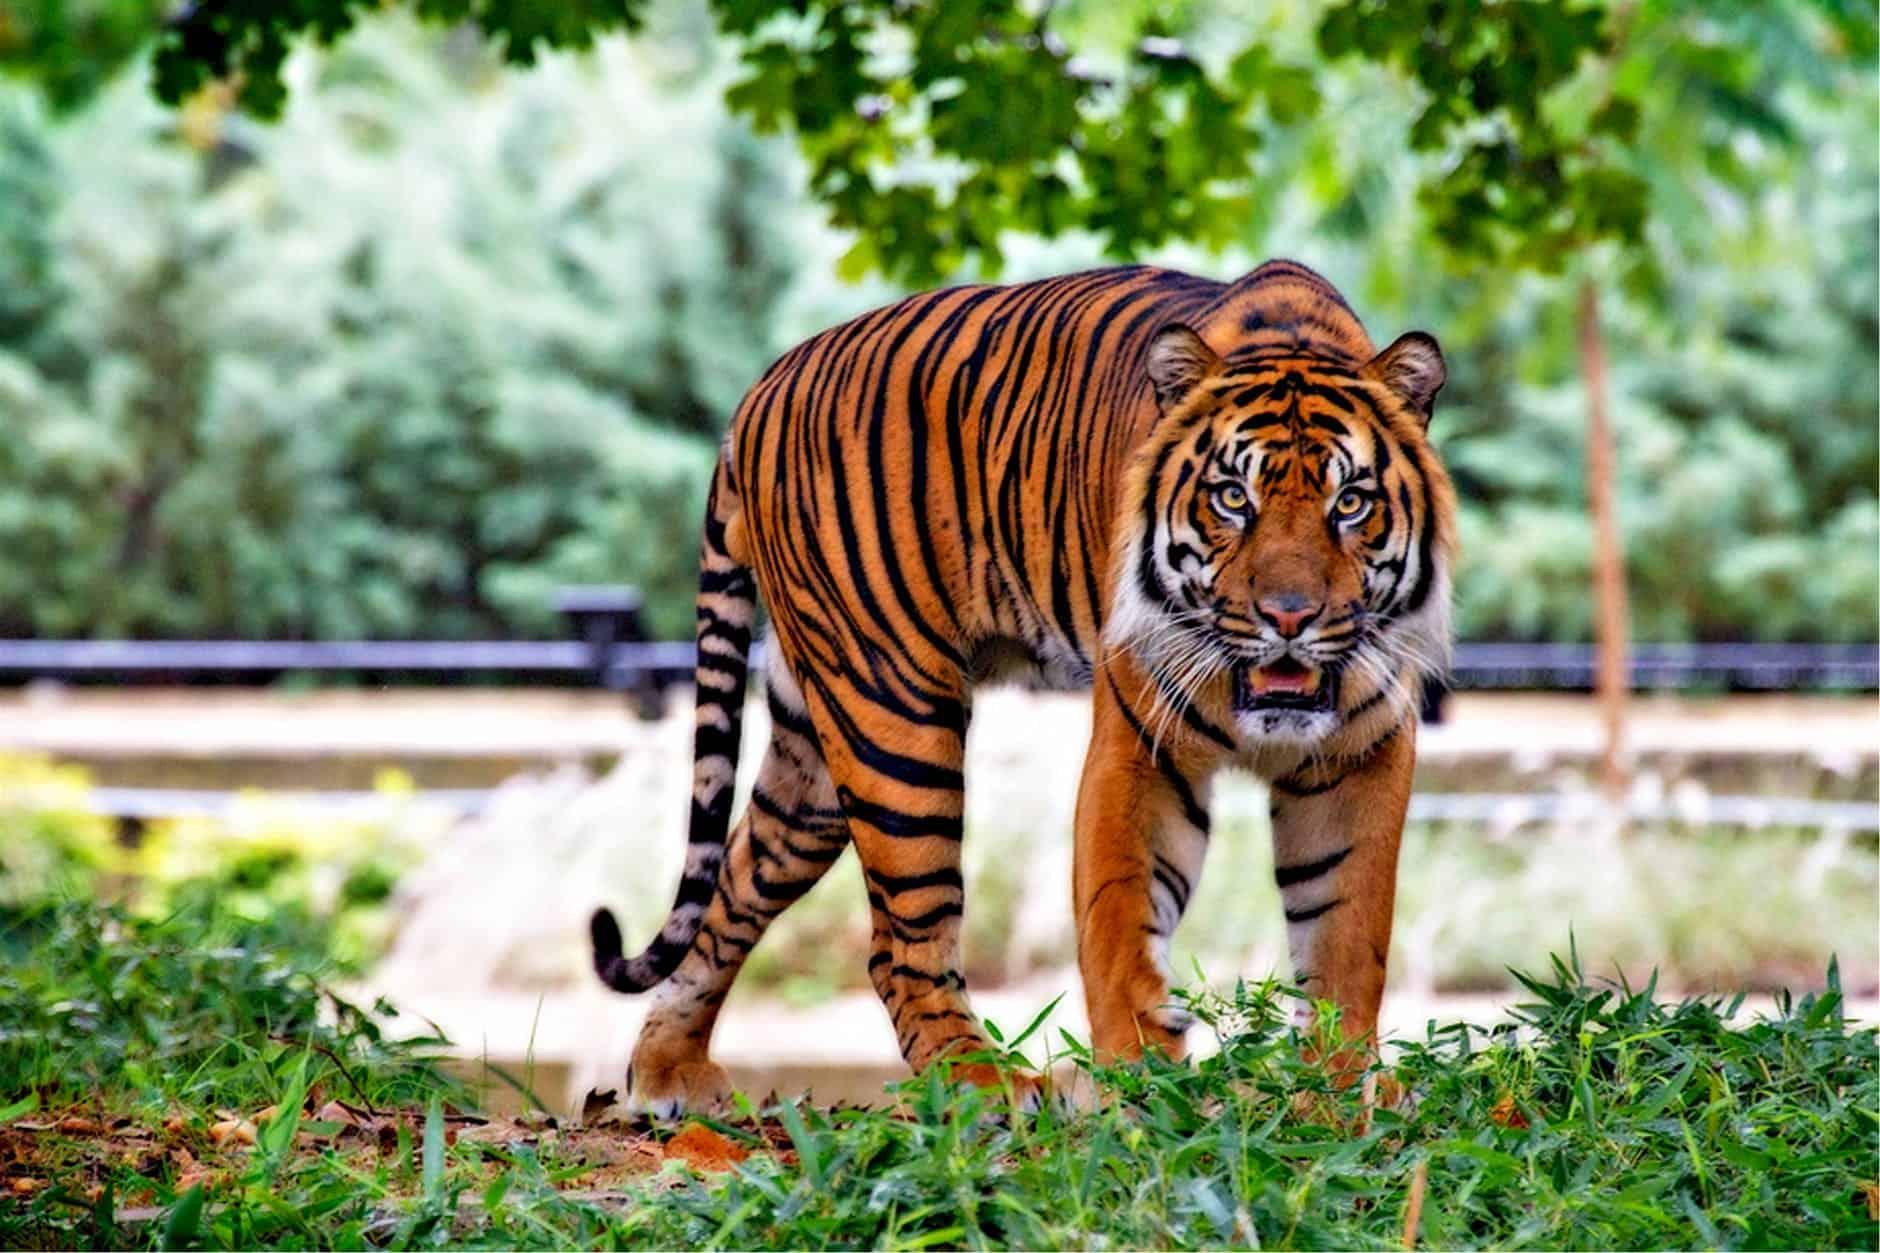 How big is a Bengal Tiger?